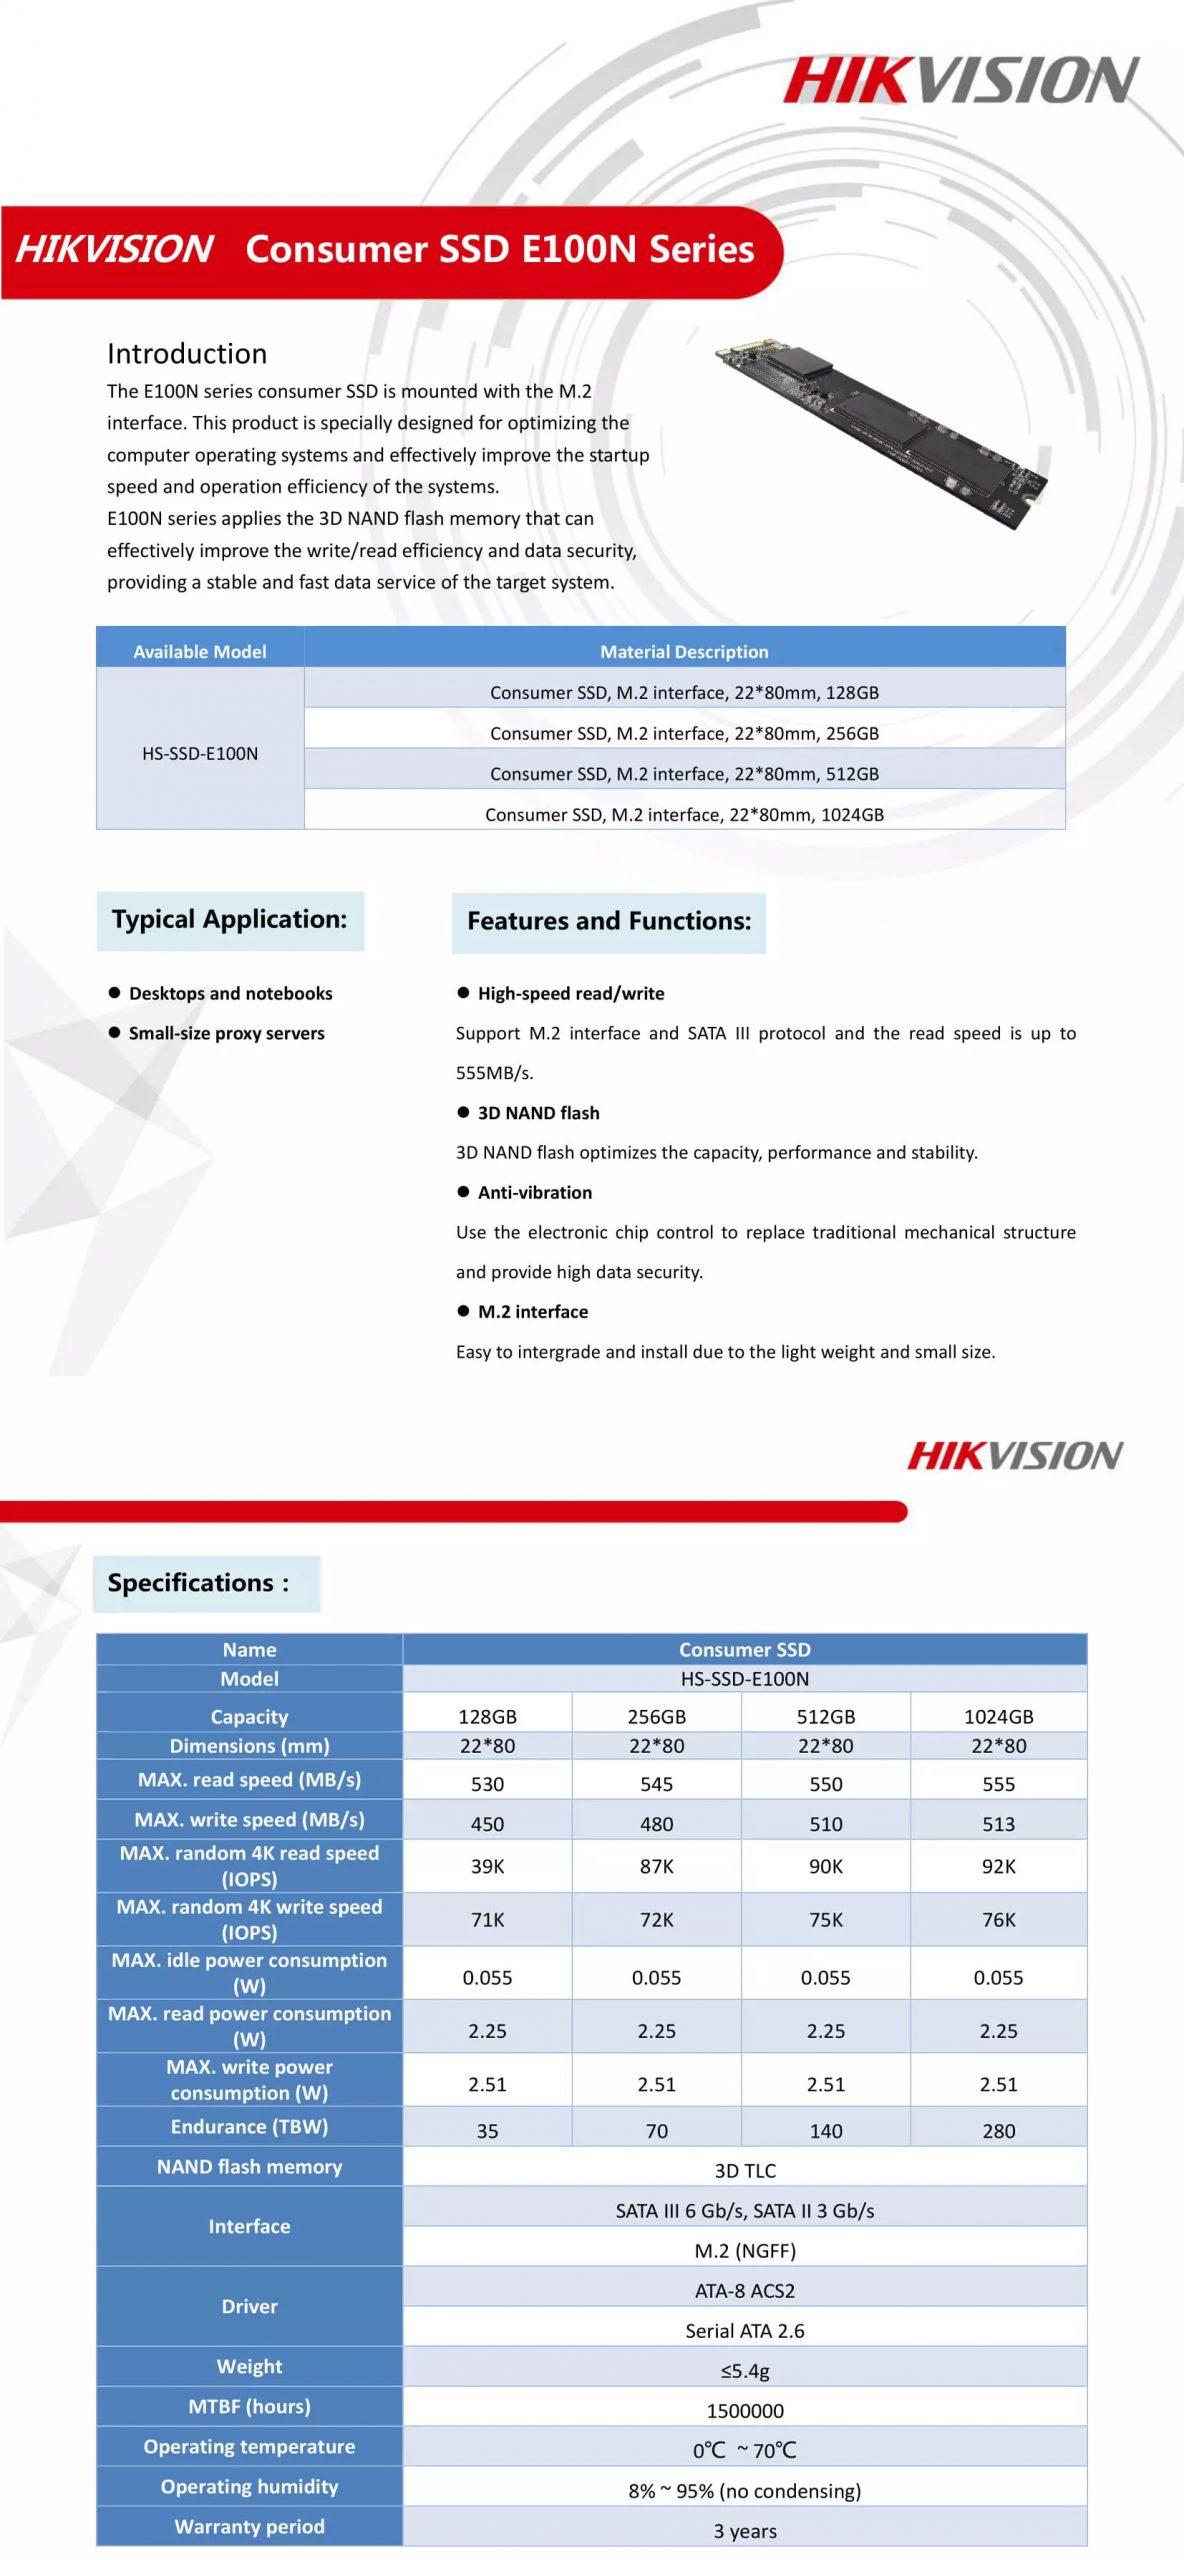 Hikvision M.2 SATA SSD